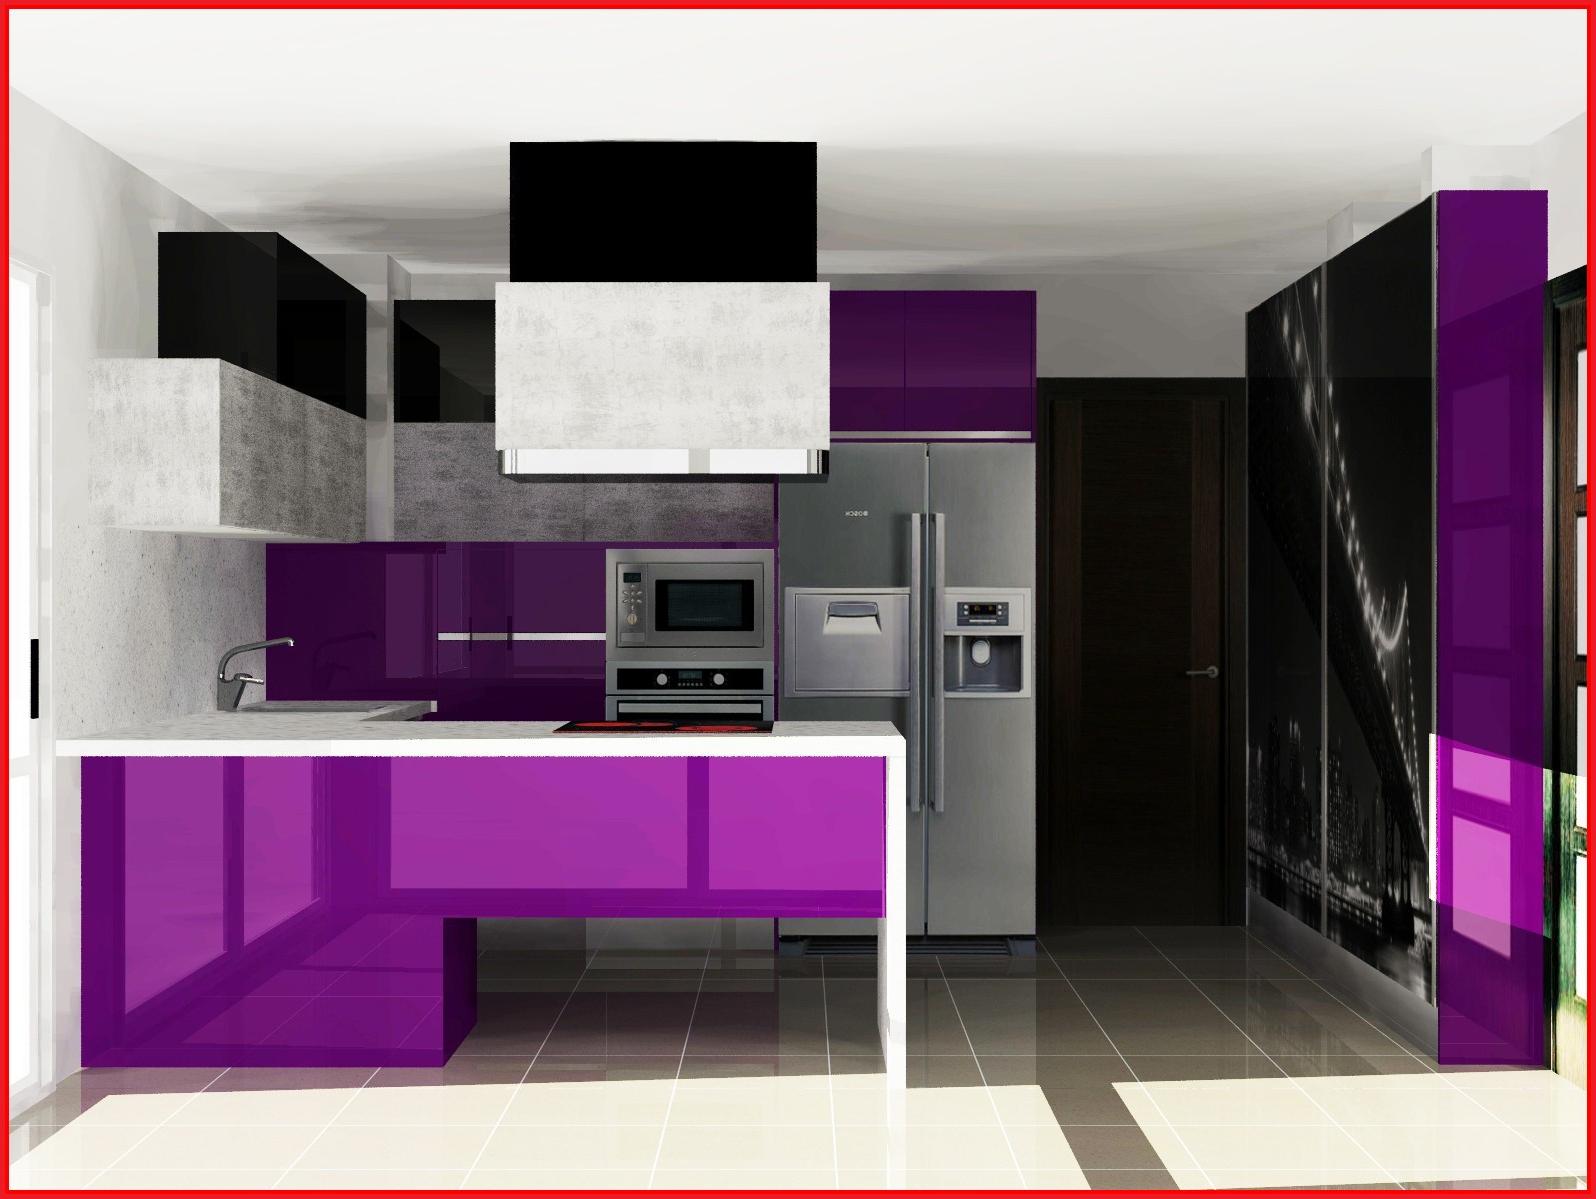 Muebles De Cocina Online Zwd9 Prar Cocina Online Prar Muebles Cocina Line Muebles De